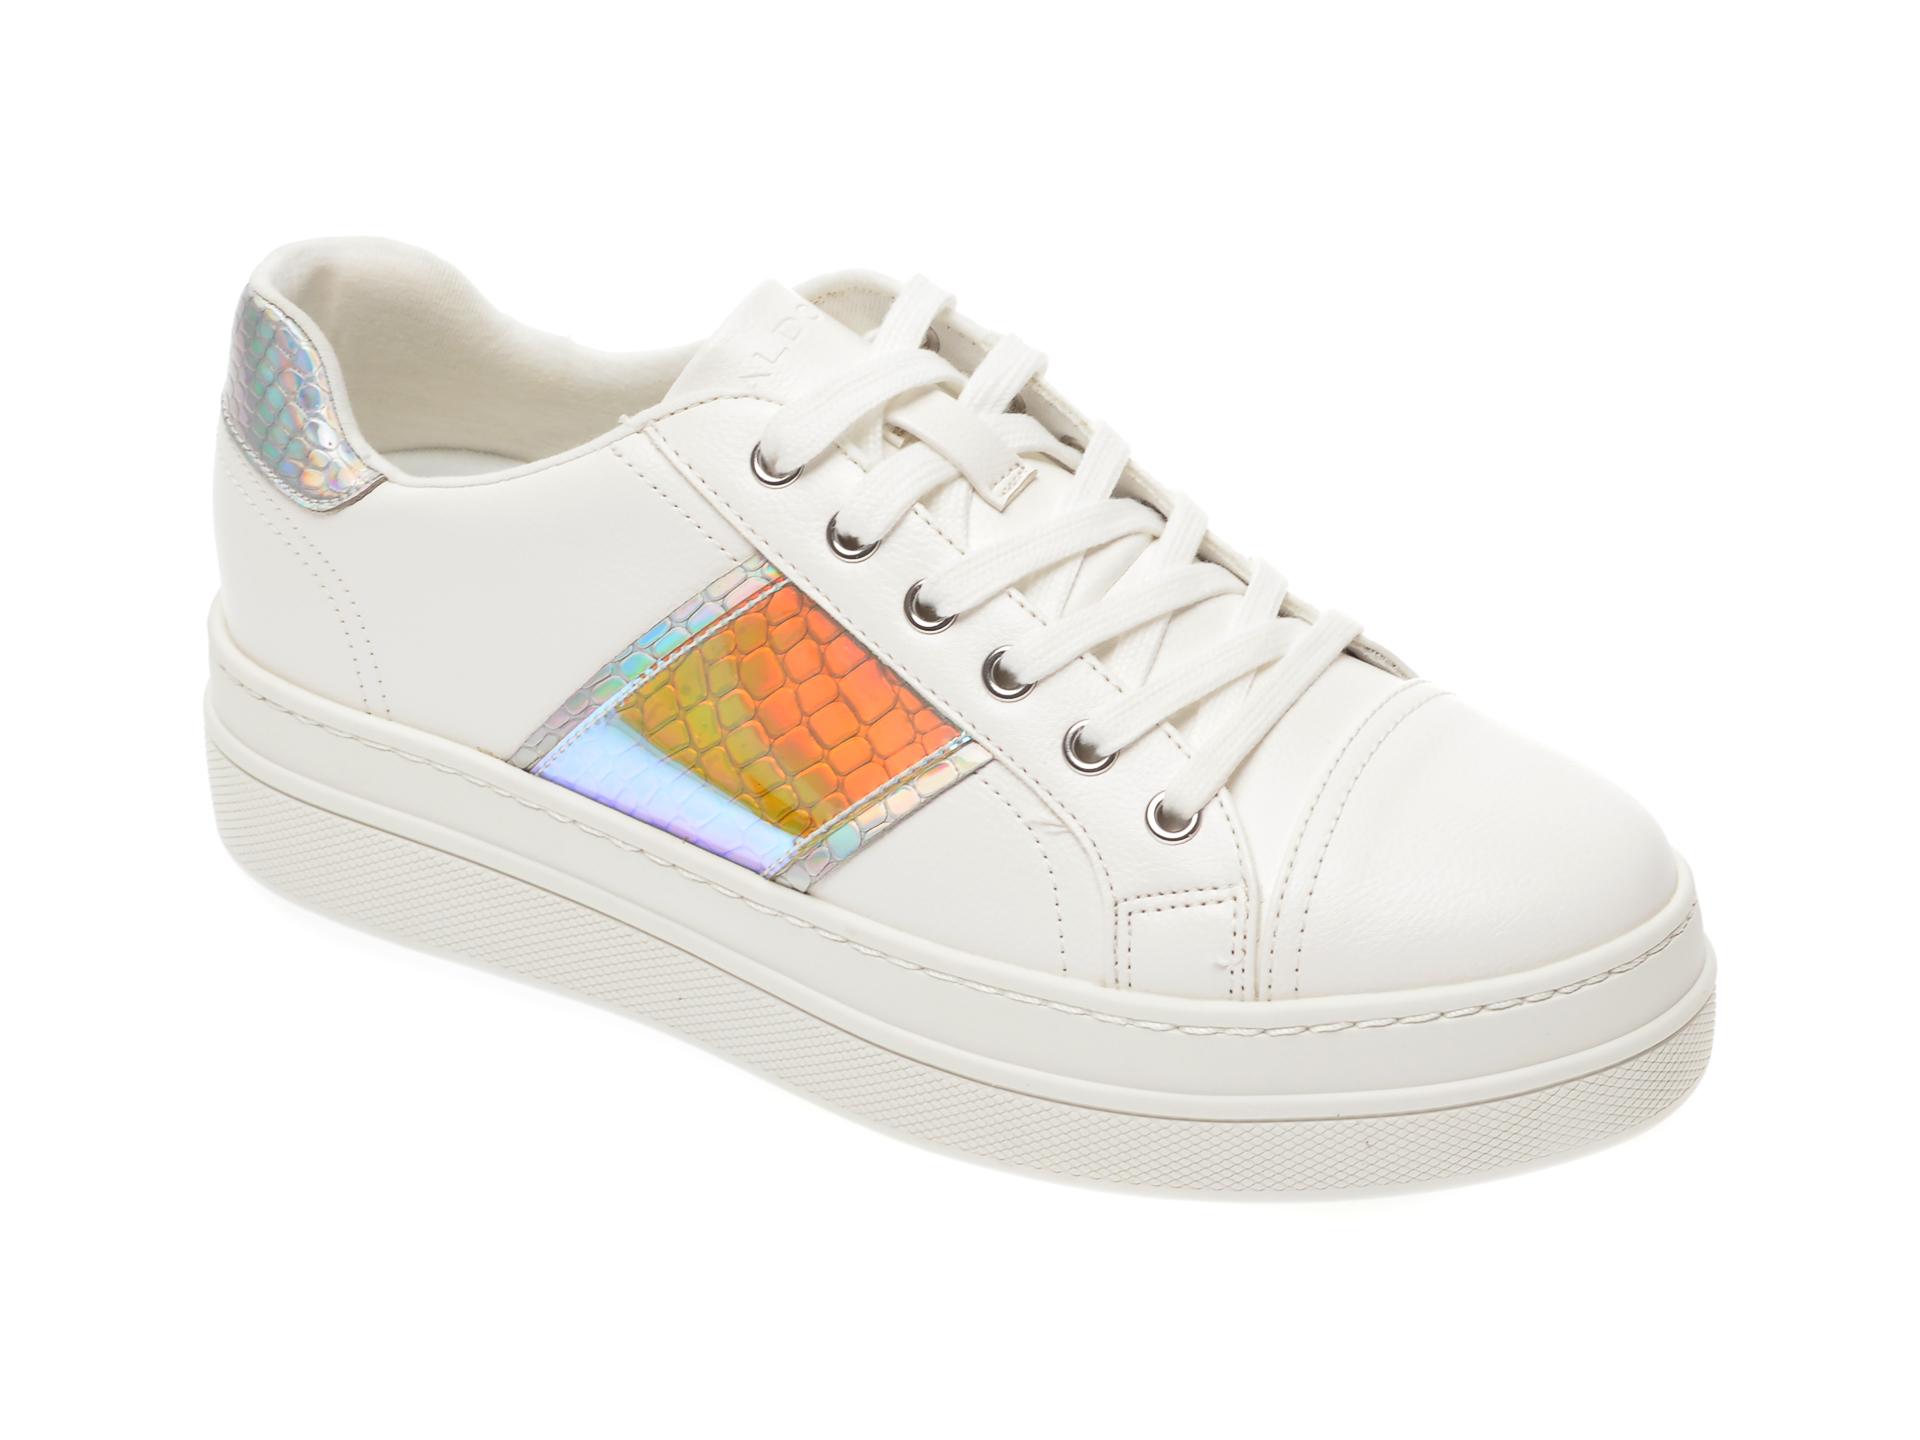 Pantofi sport ALDO argintii, Starburst962, din piele ecologica imagine otter.ro